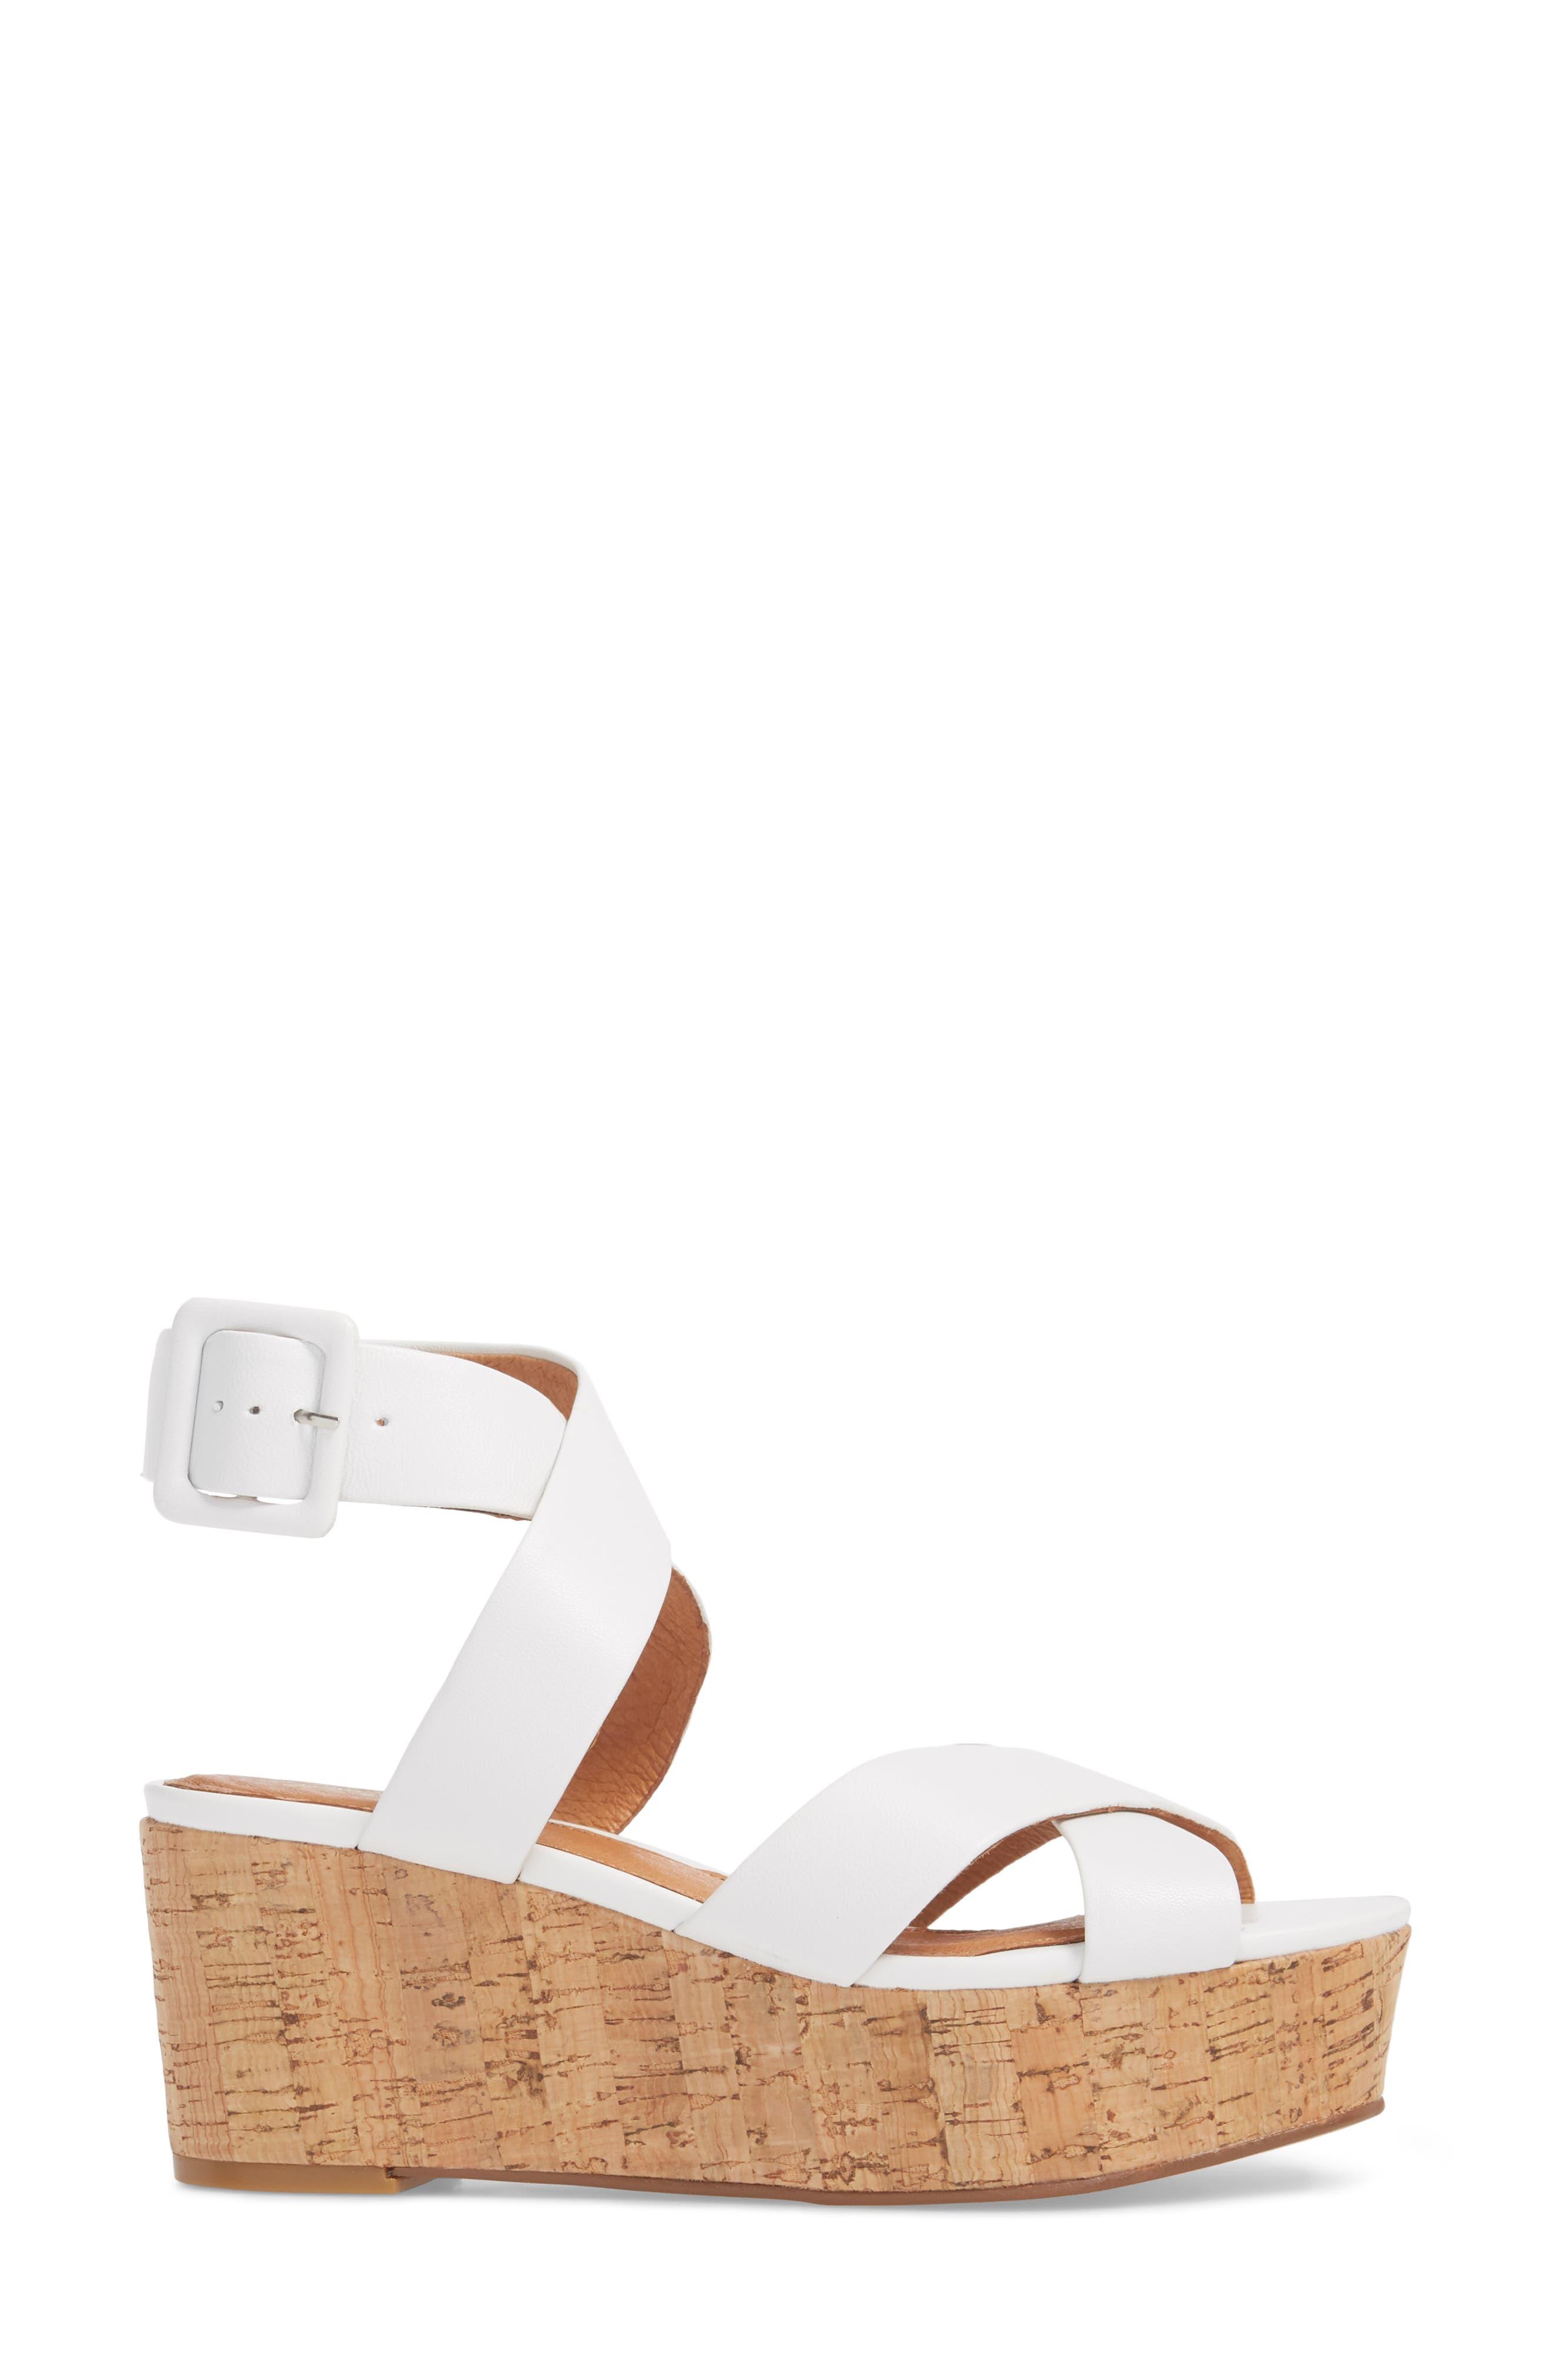 Evie Platform Wedge Sandal,                             Alternate thumbnail 6, color,